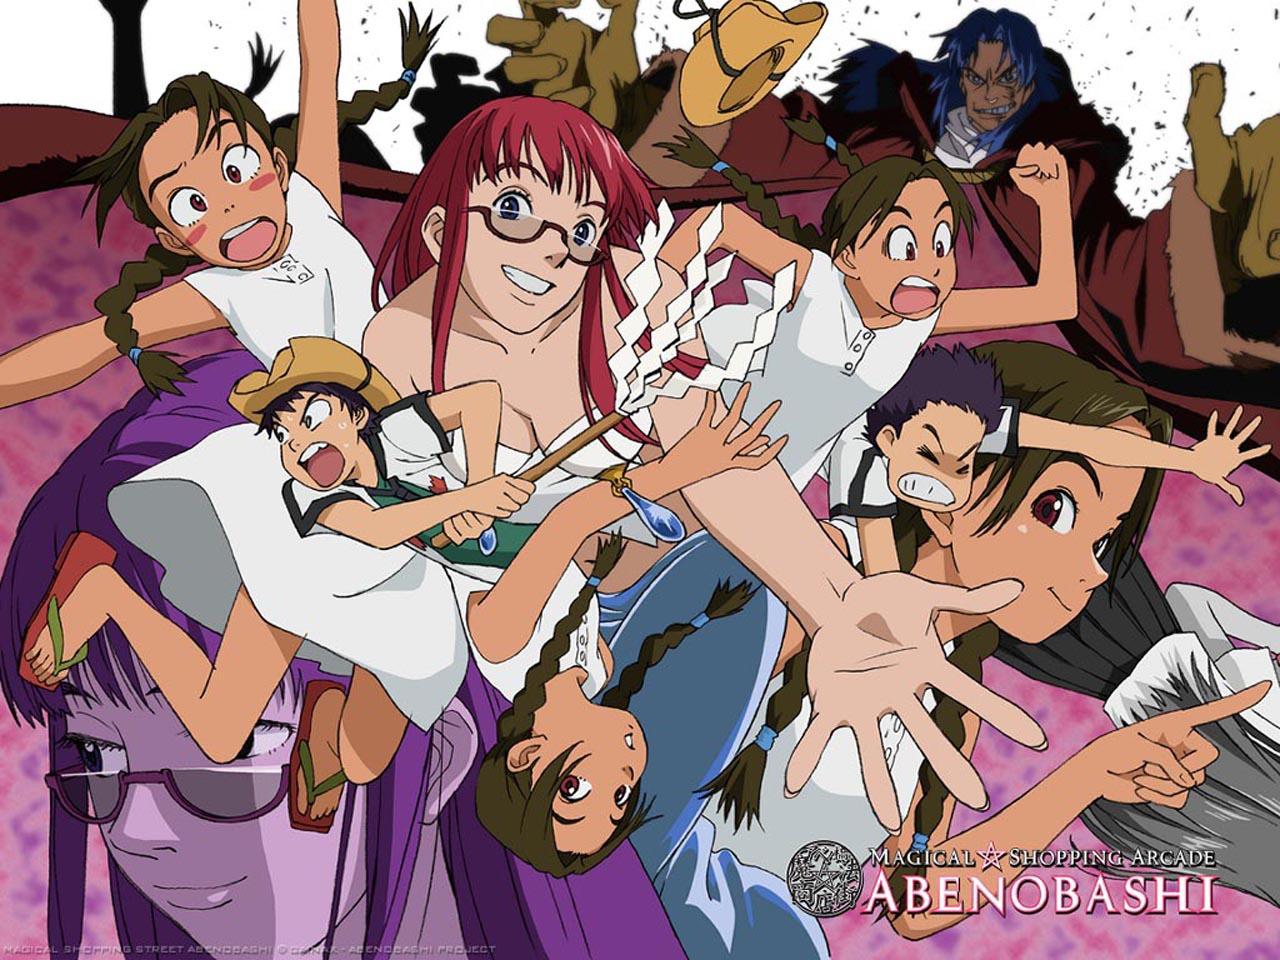 Download HQ Abenobashi wallpaper / Anime / 1280x960